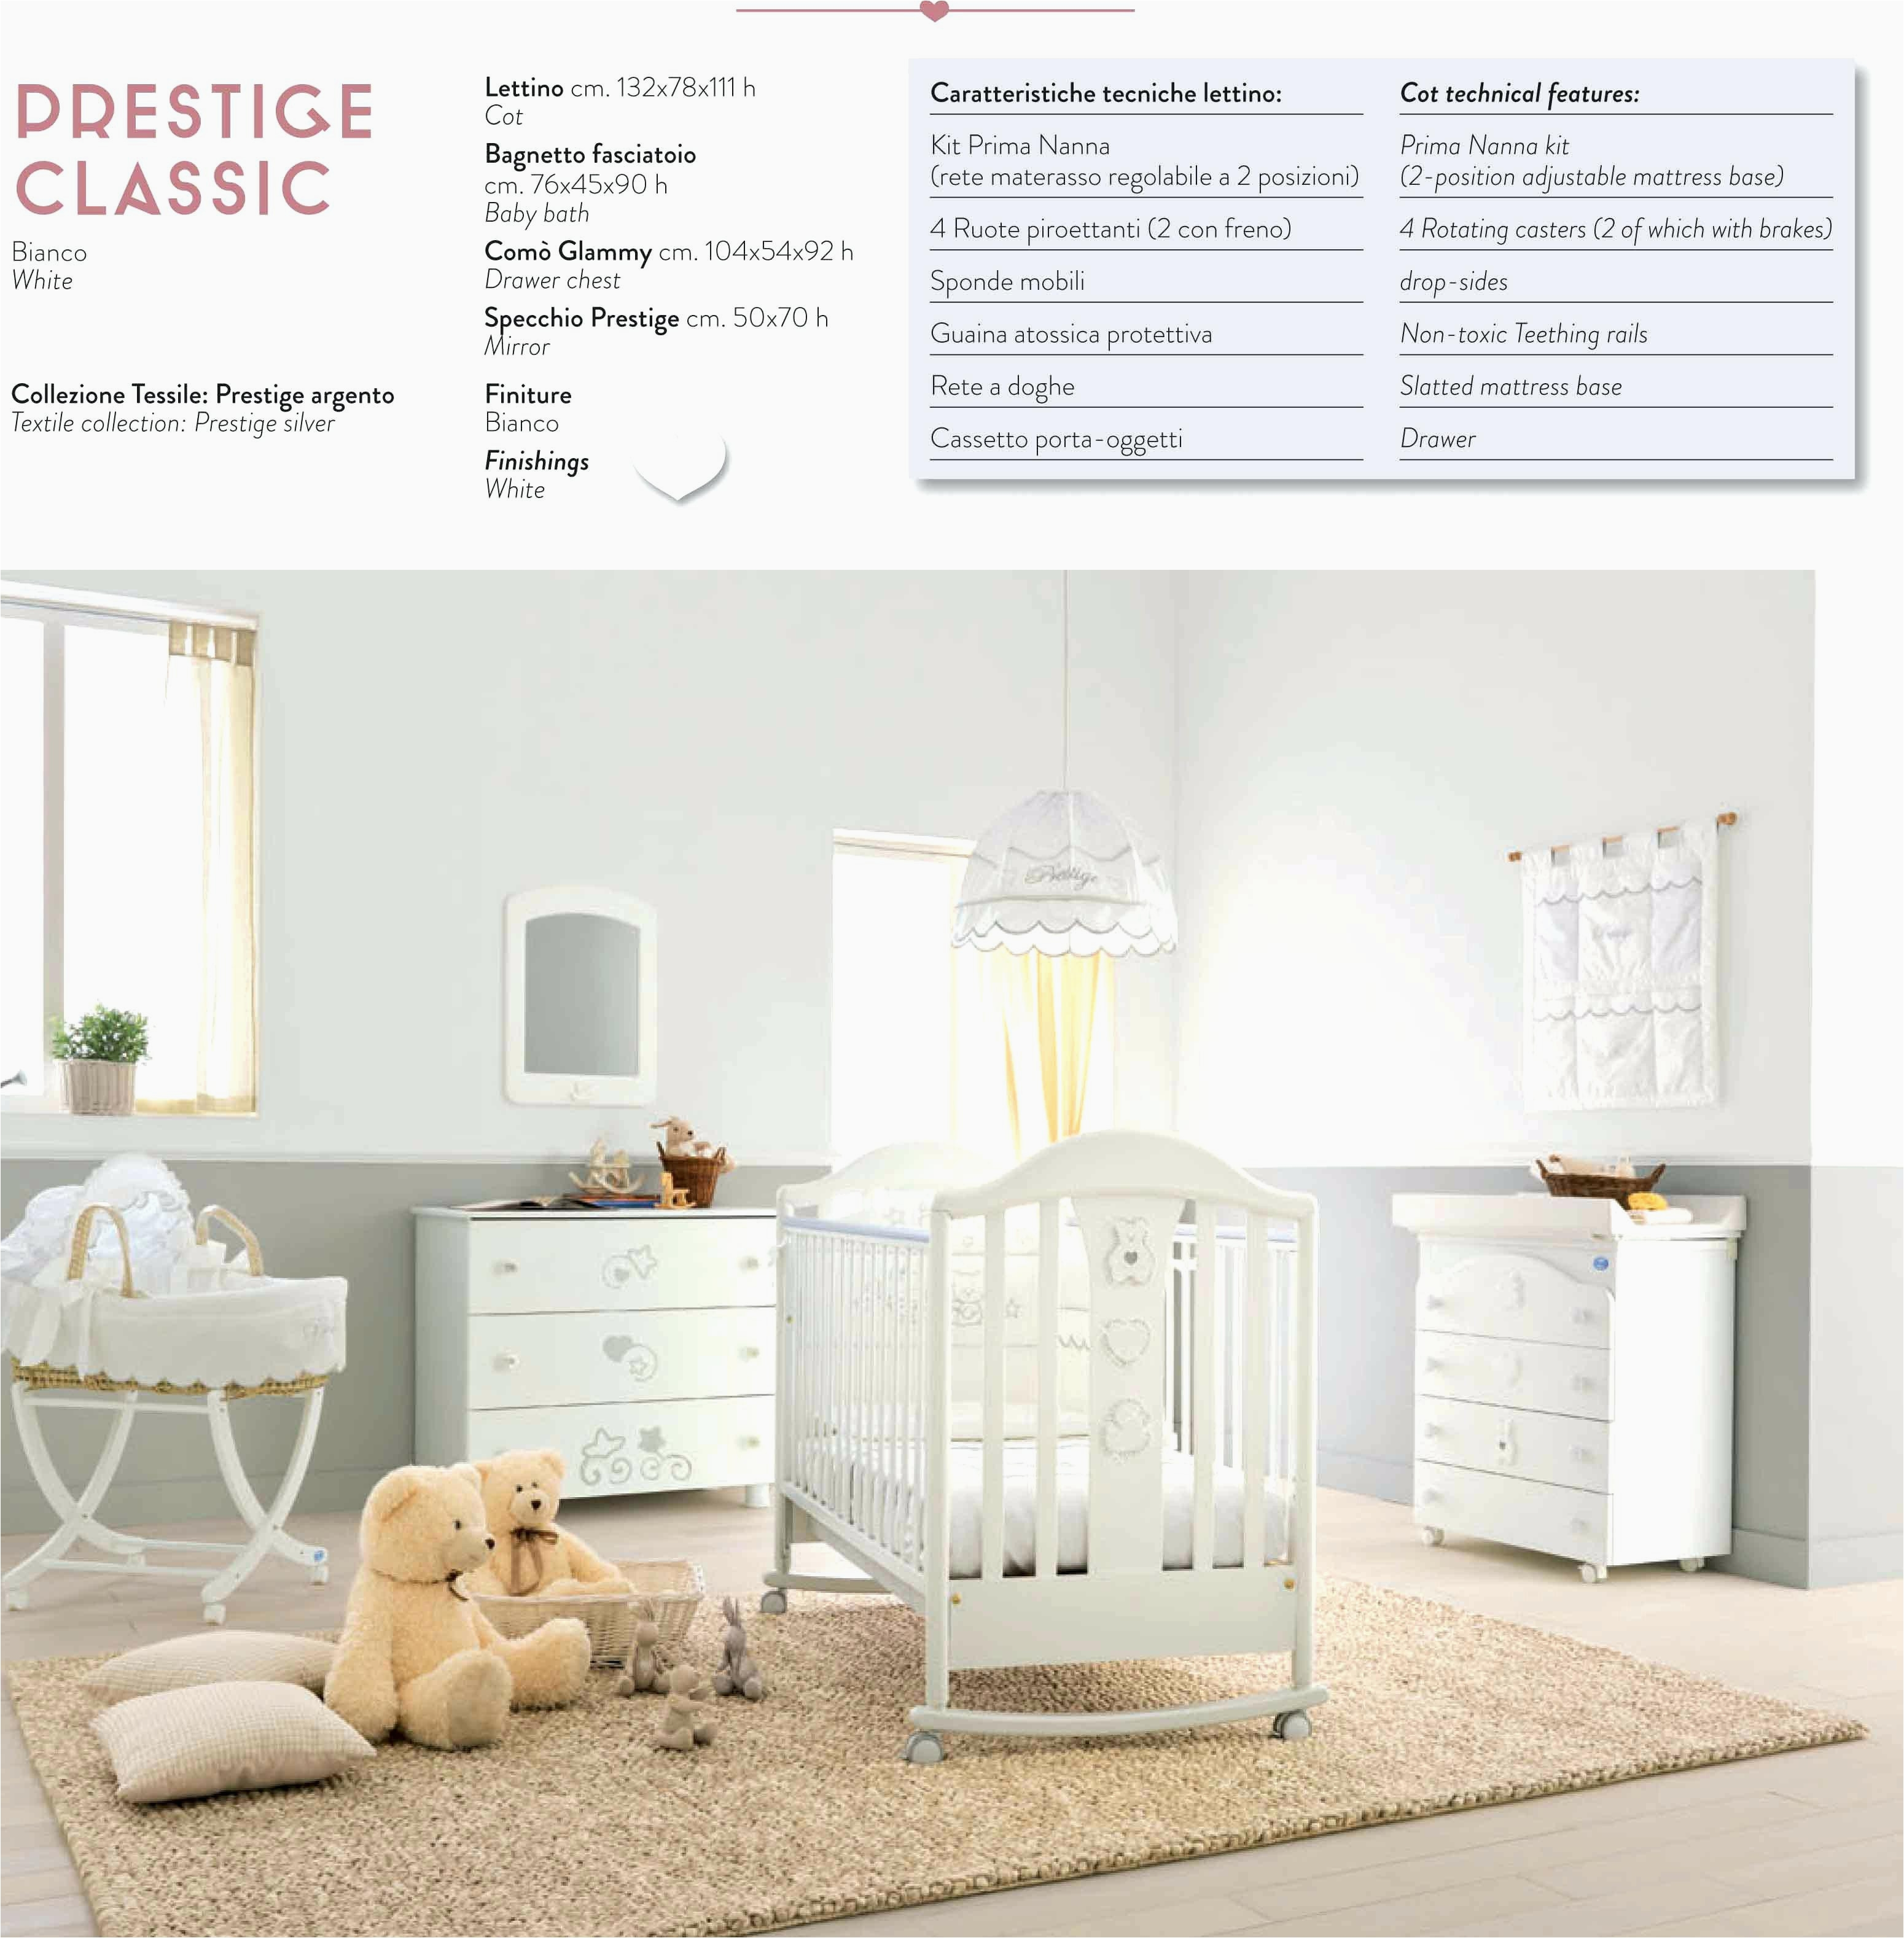 Craigslist Nj north Furniture Craigslist Baby Furniture for Sale by Owner Fresh Craigslist Baby